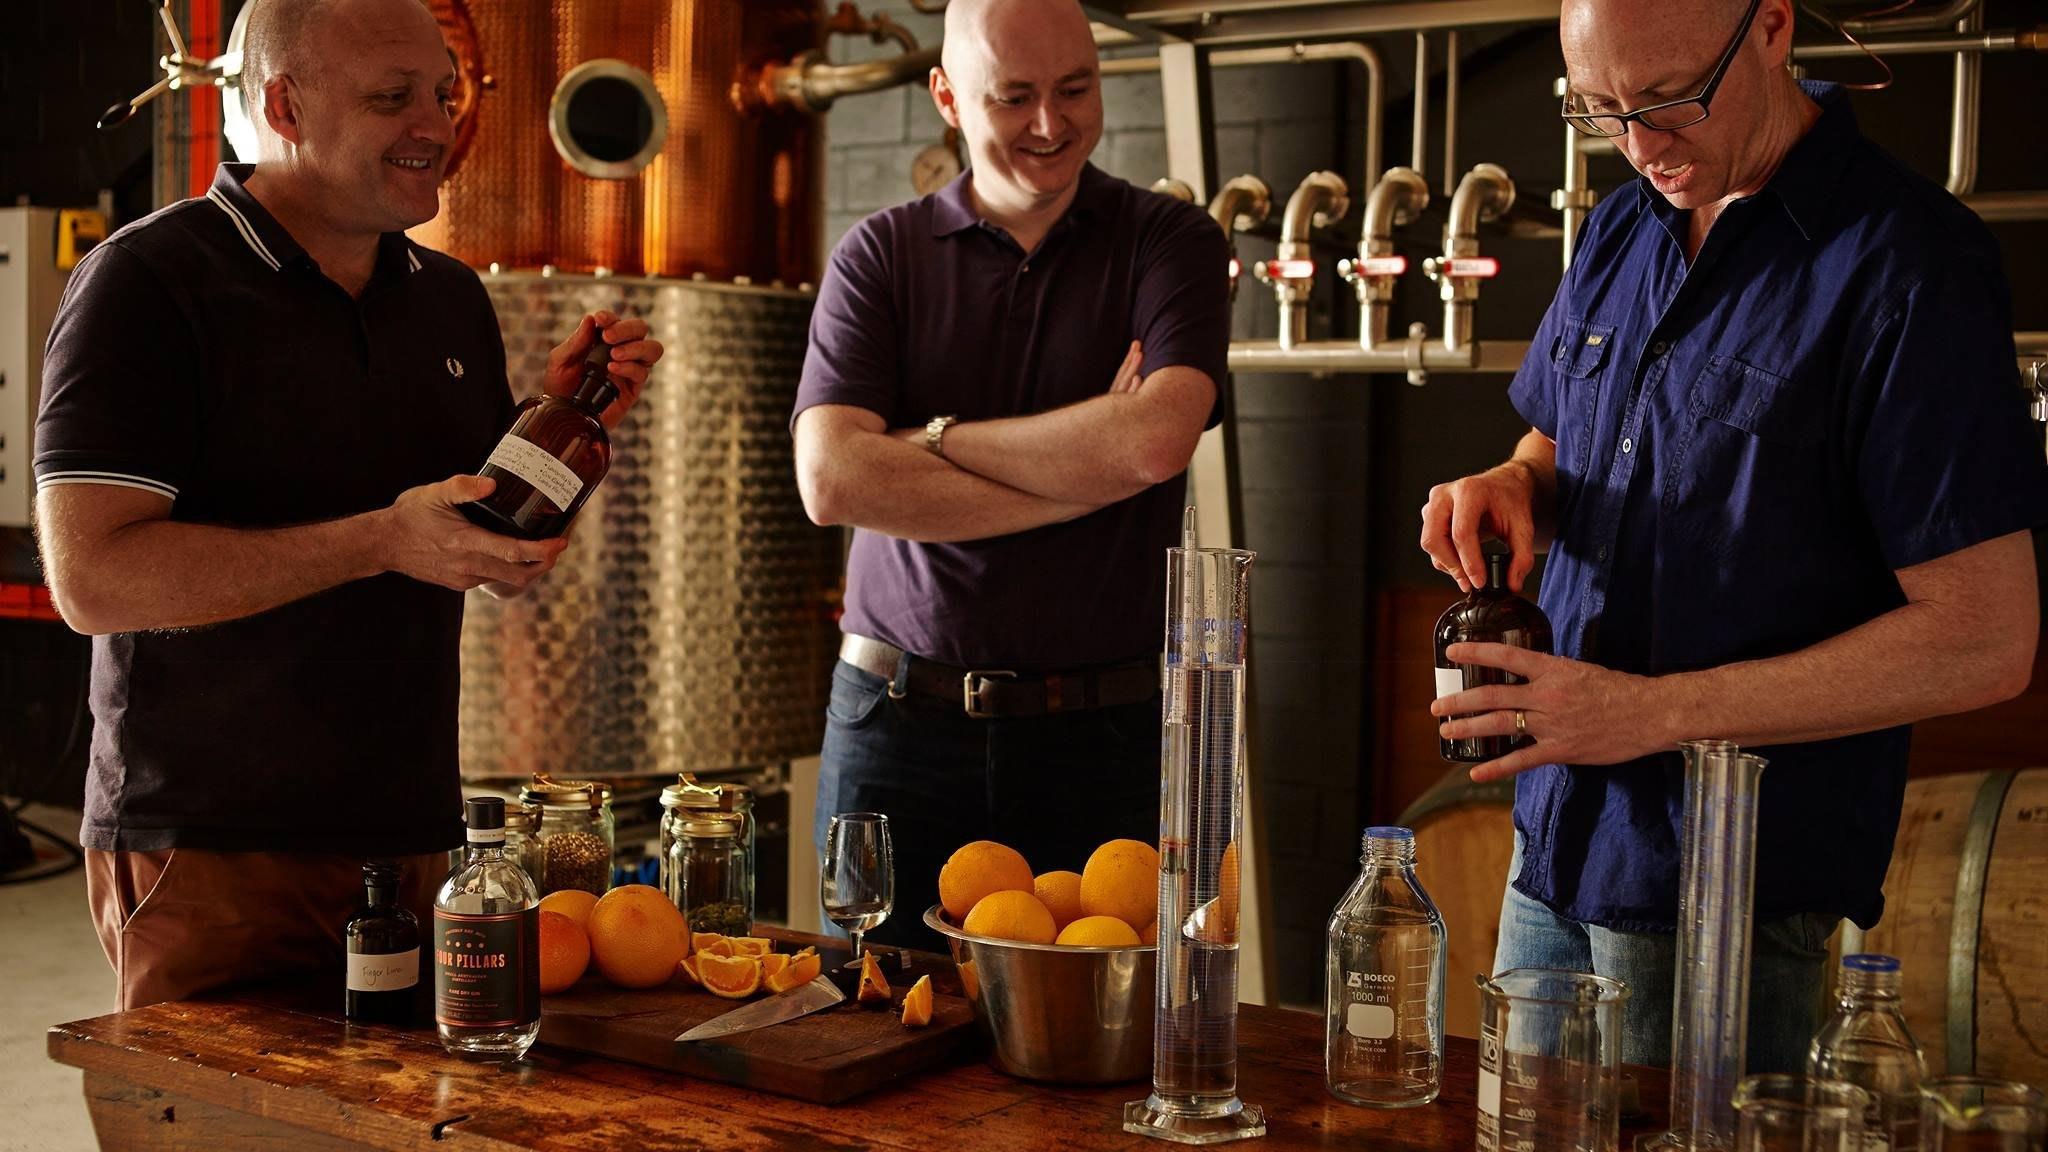 Tasting the Gin at Four Pillars